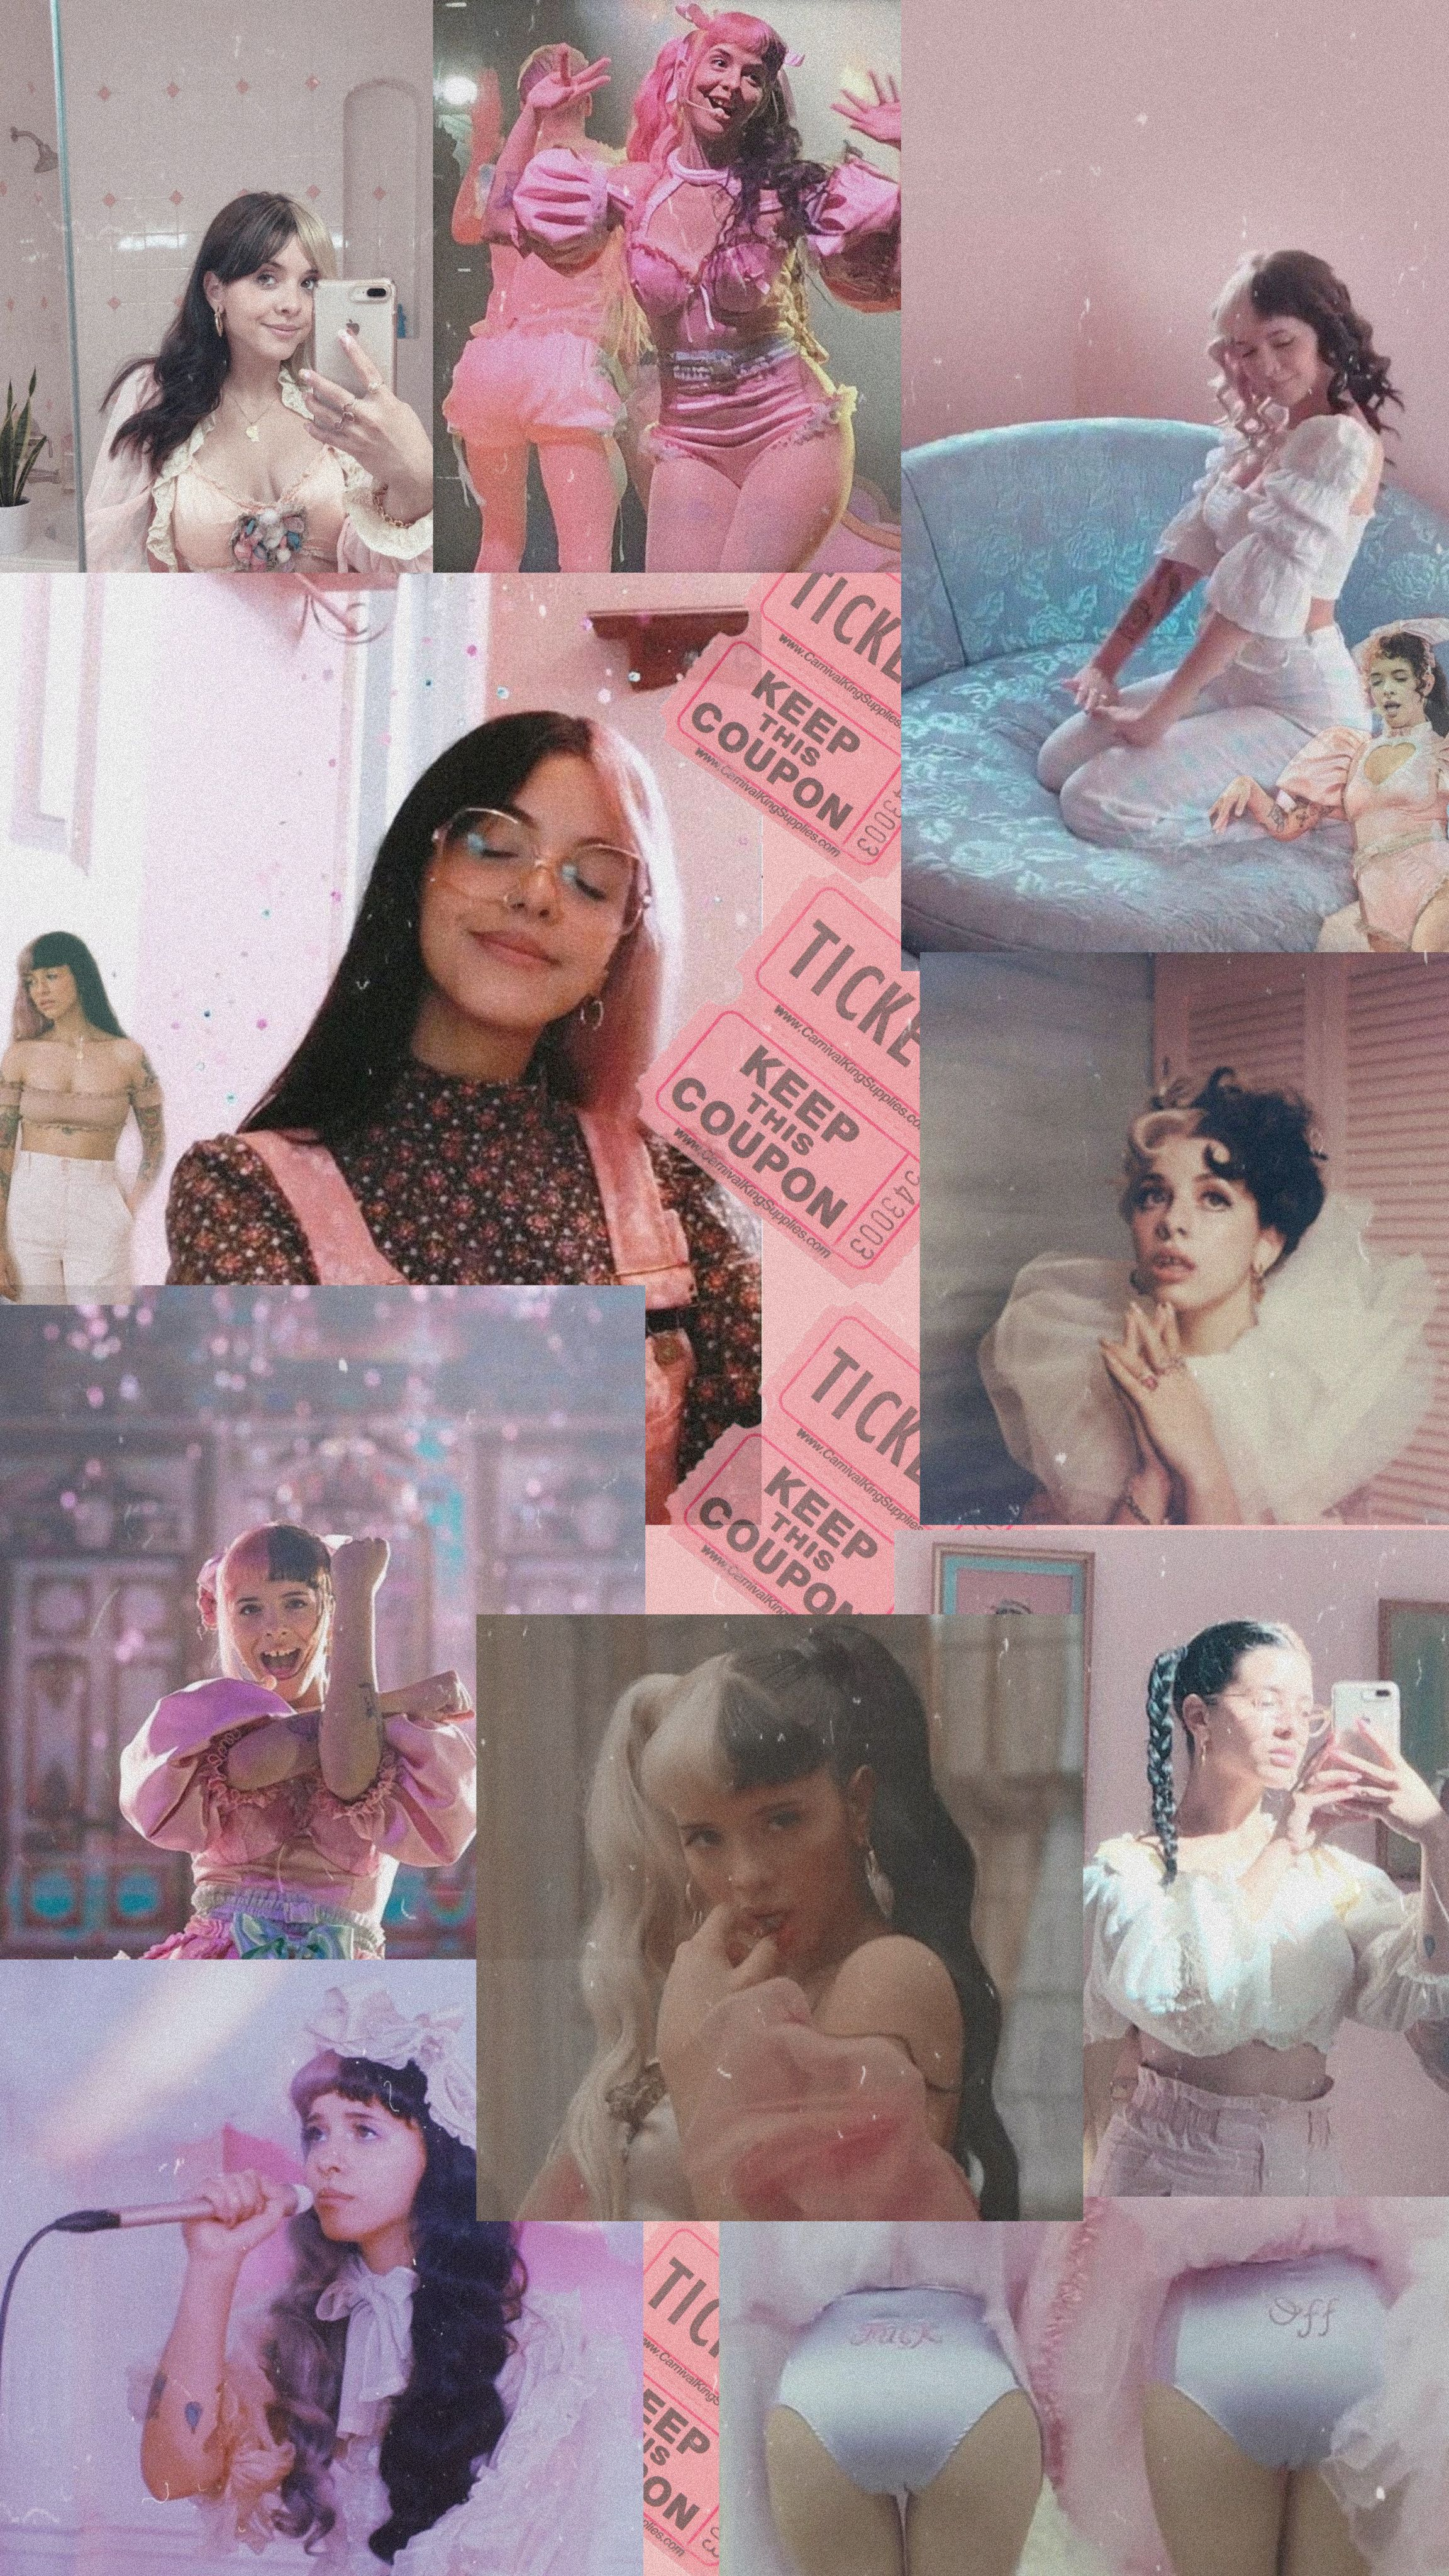 Melanie Martinez Wallpaper Melanie Martinez Melanie Crybaby Melanie Martinez